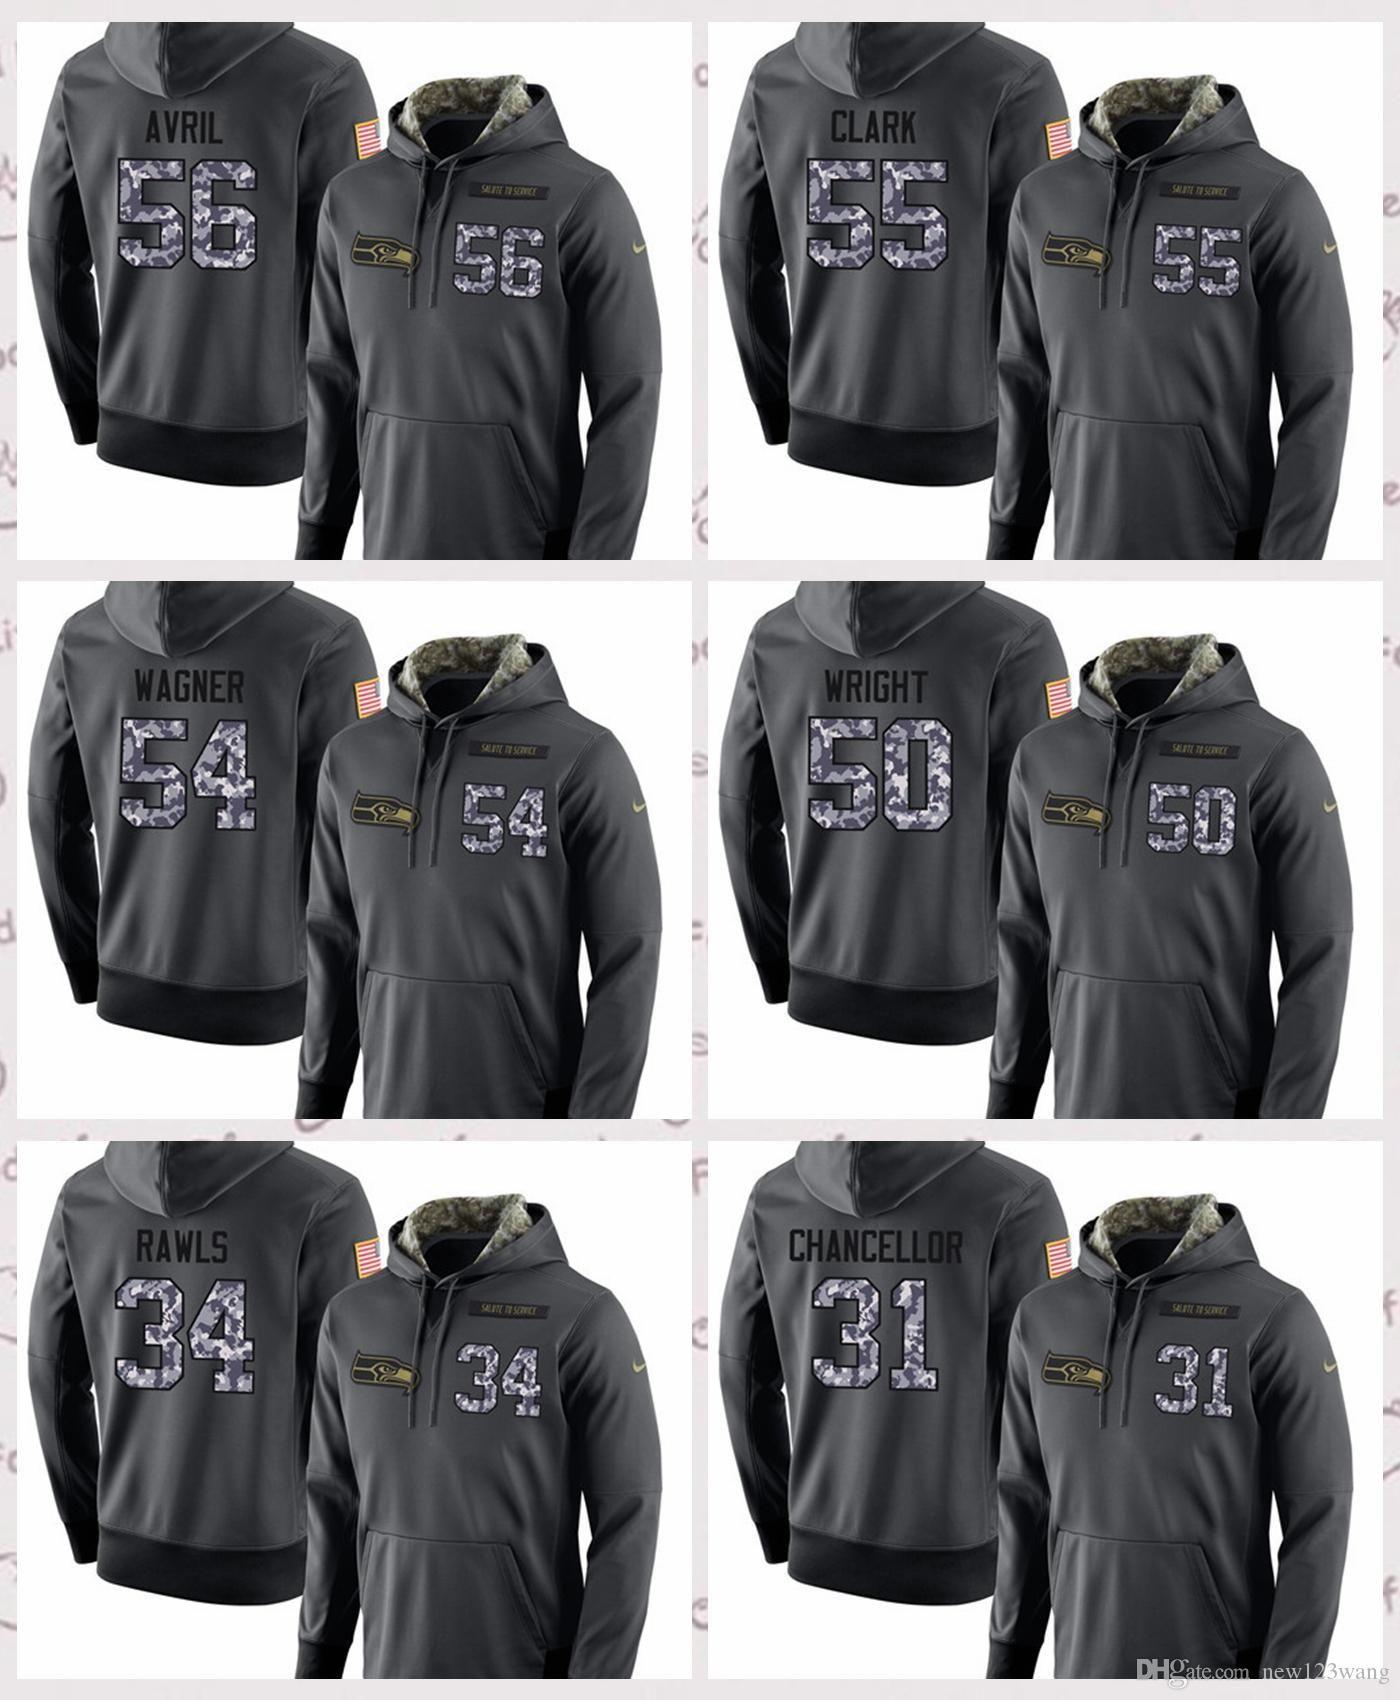 186215031 Compre Seattle Seahawks Masculino   56   55   54   50   34   31 Número Do  Jogador E Nome De Esportes De Lazer Versão Geral Cinza Escuro Cap Sem Forro  ...